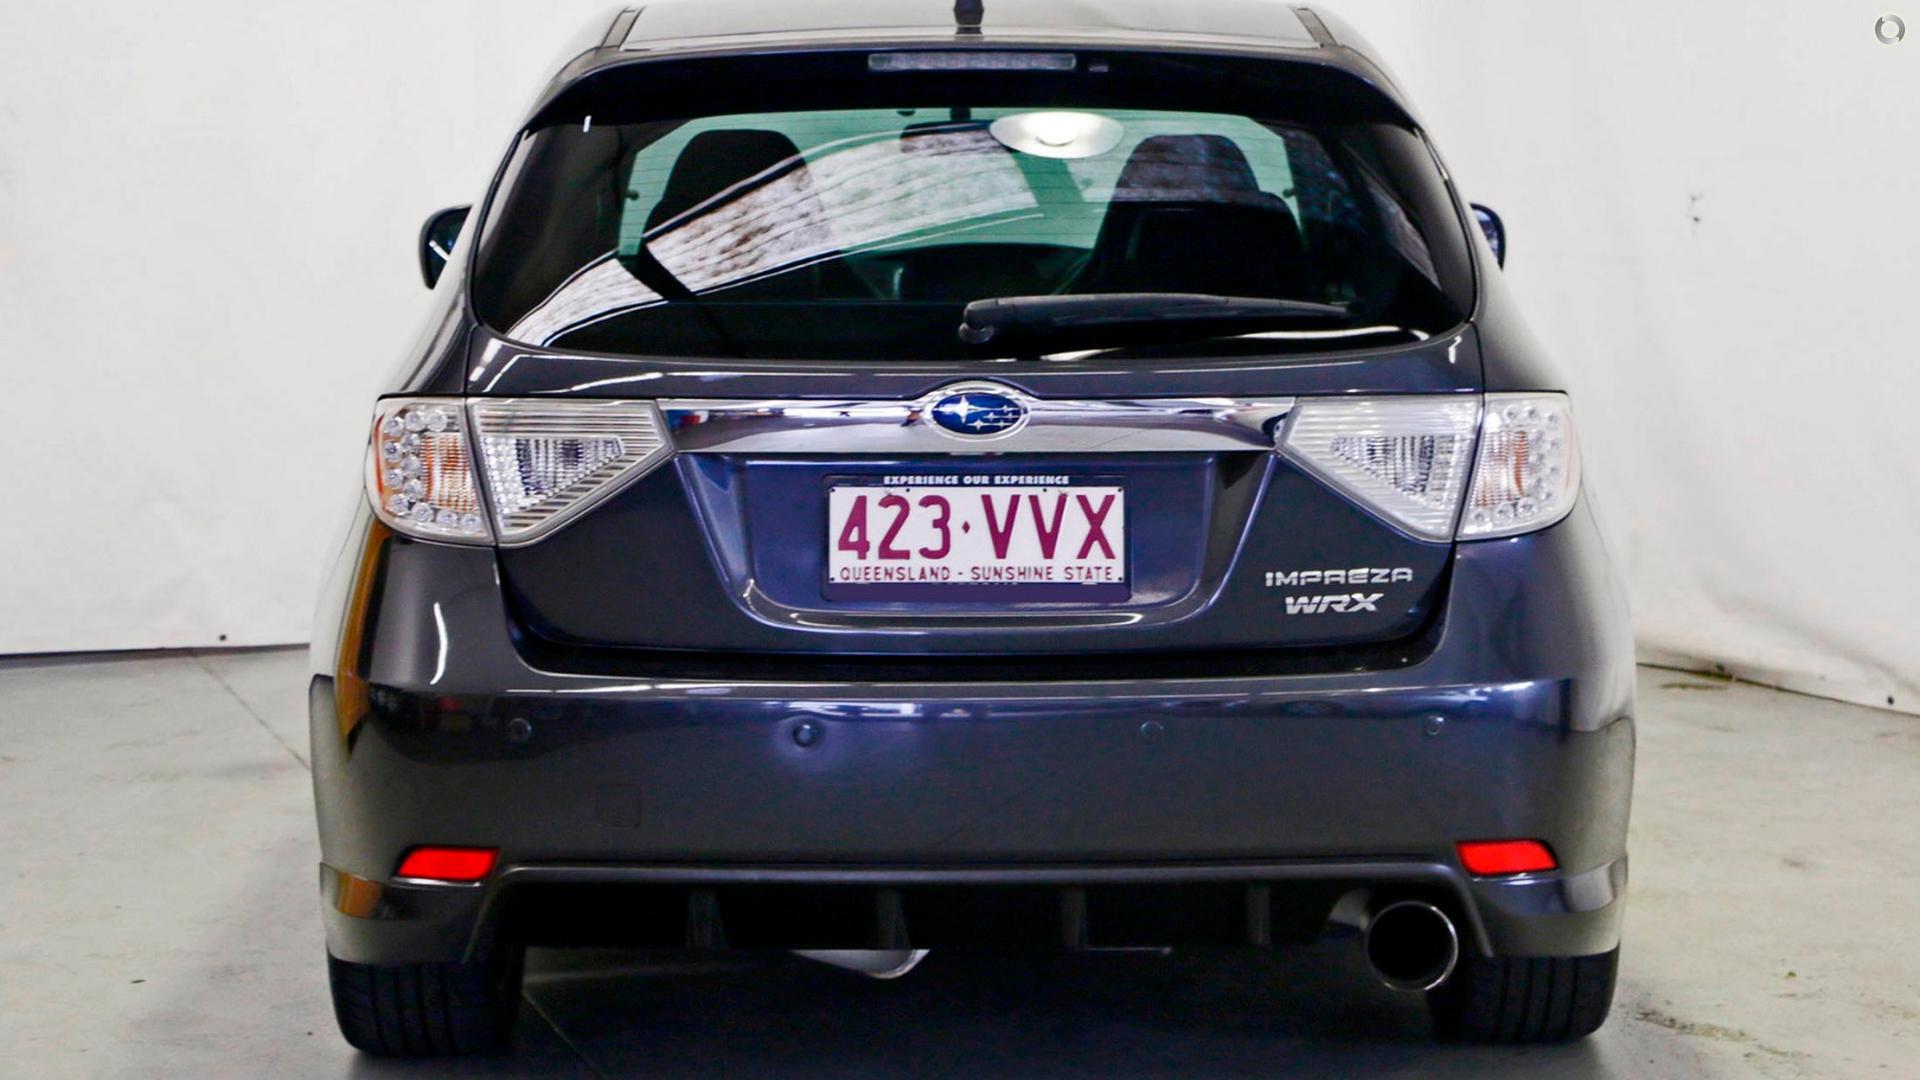 2008 Subaru Impreza WRX G3